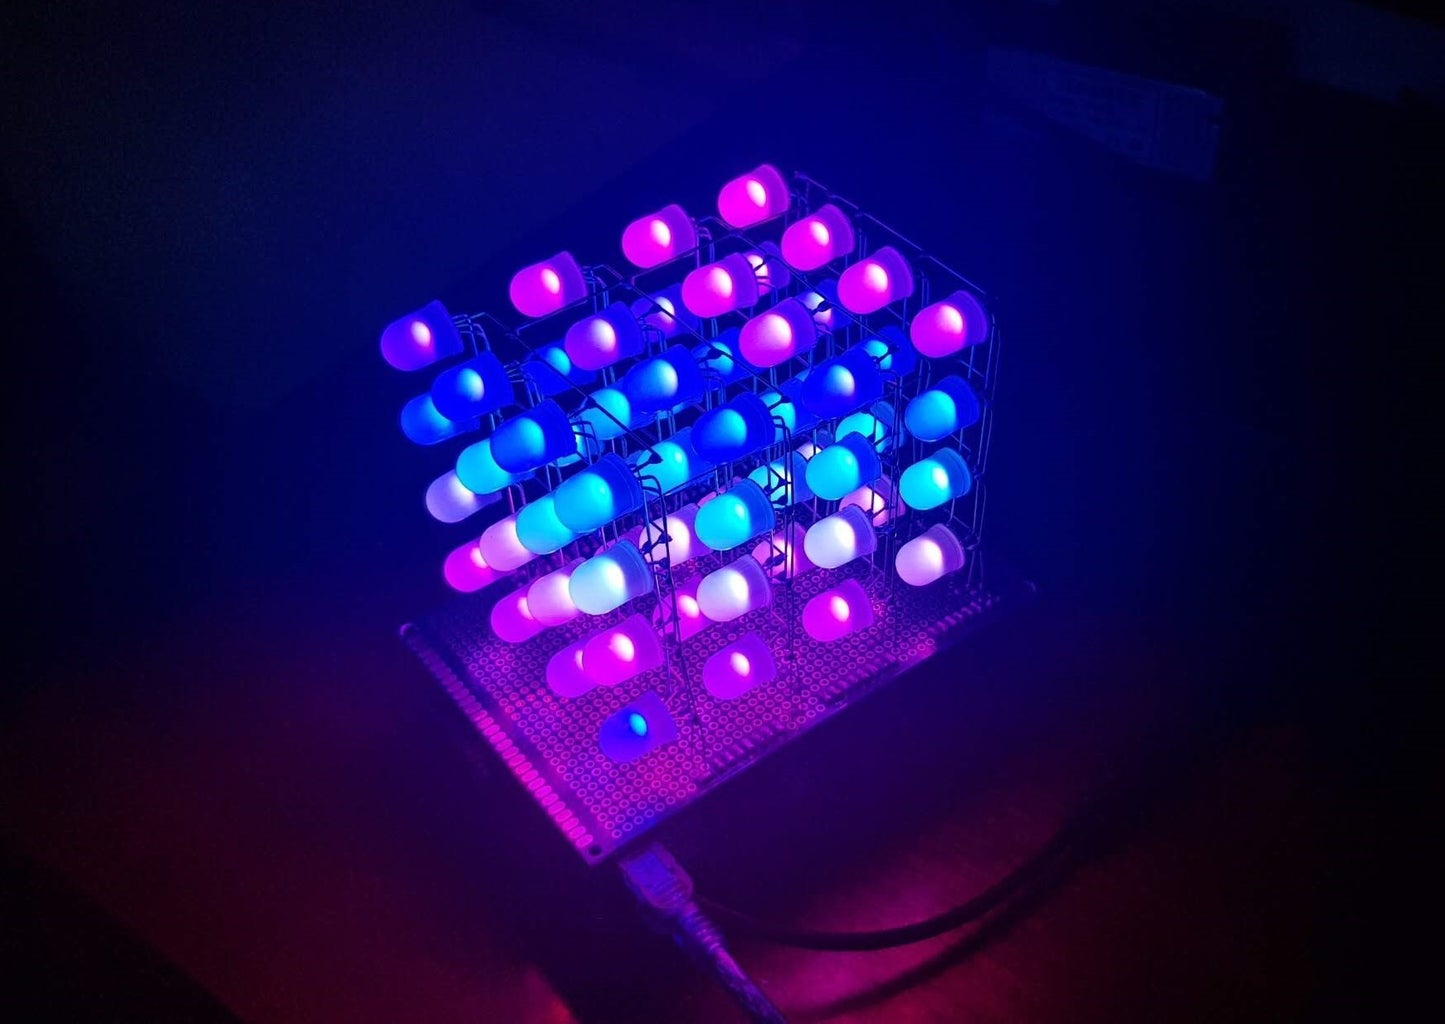 RGB LED CUBE 4x4x4